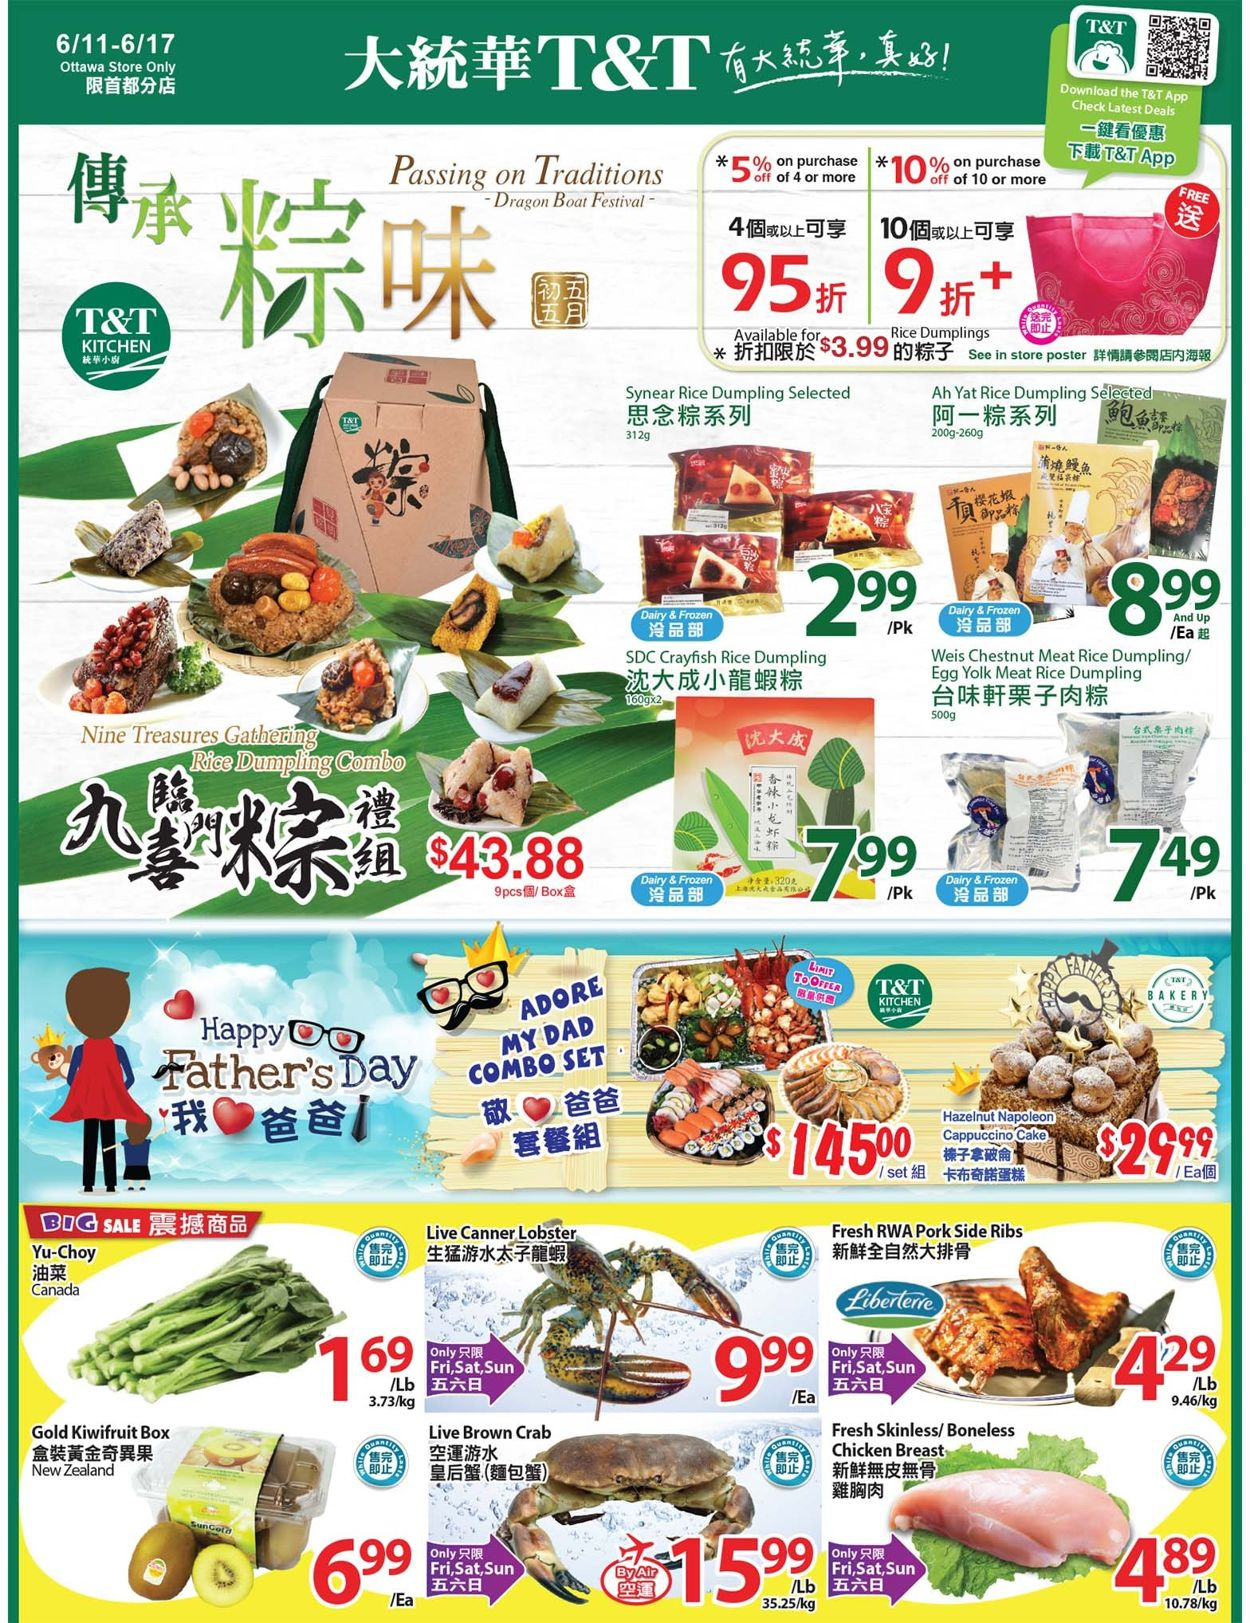 T&T Supermarket - Ottawa Flyer - 06/11-06/17/2021